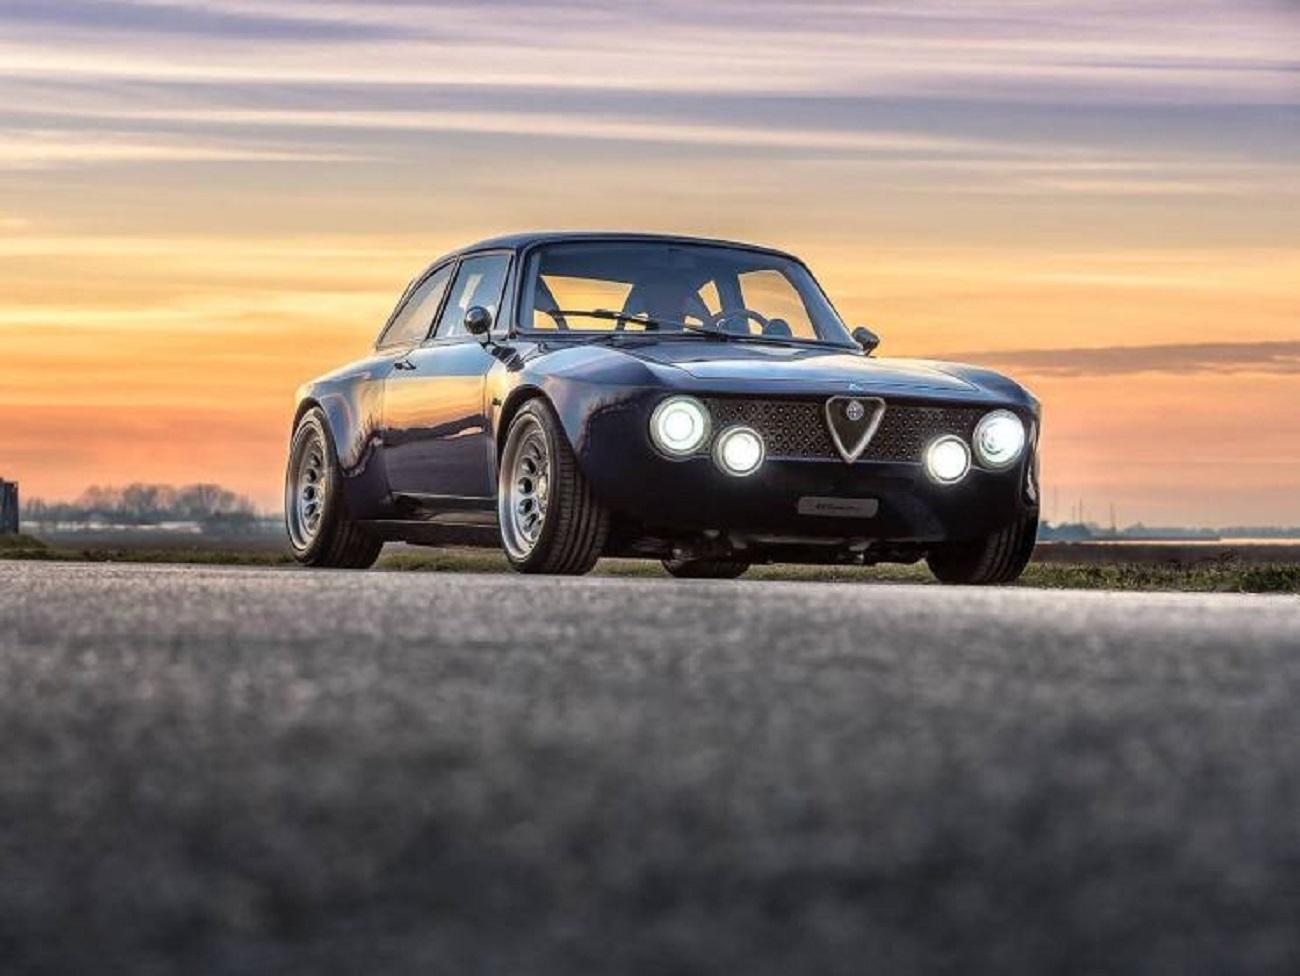 Alfa Giulia GT da 430 mila euro: interamente elettrica, prestazioni da supercar